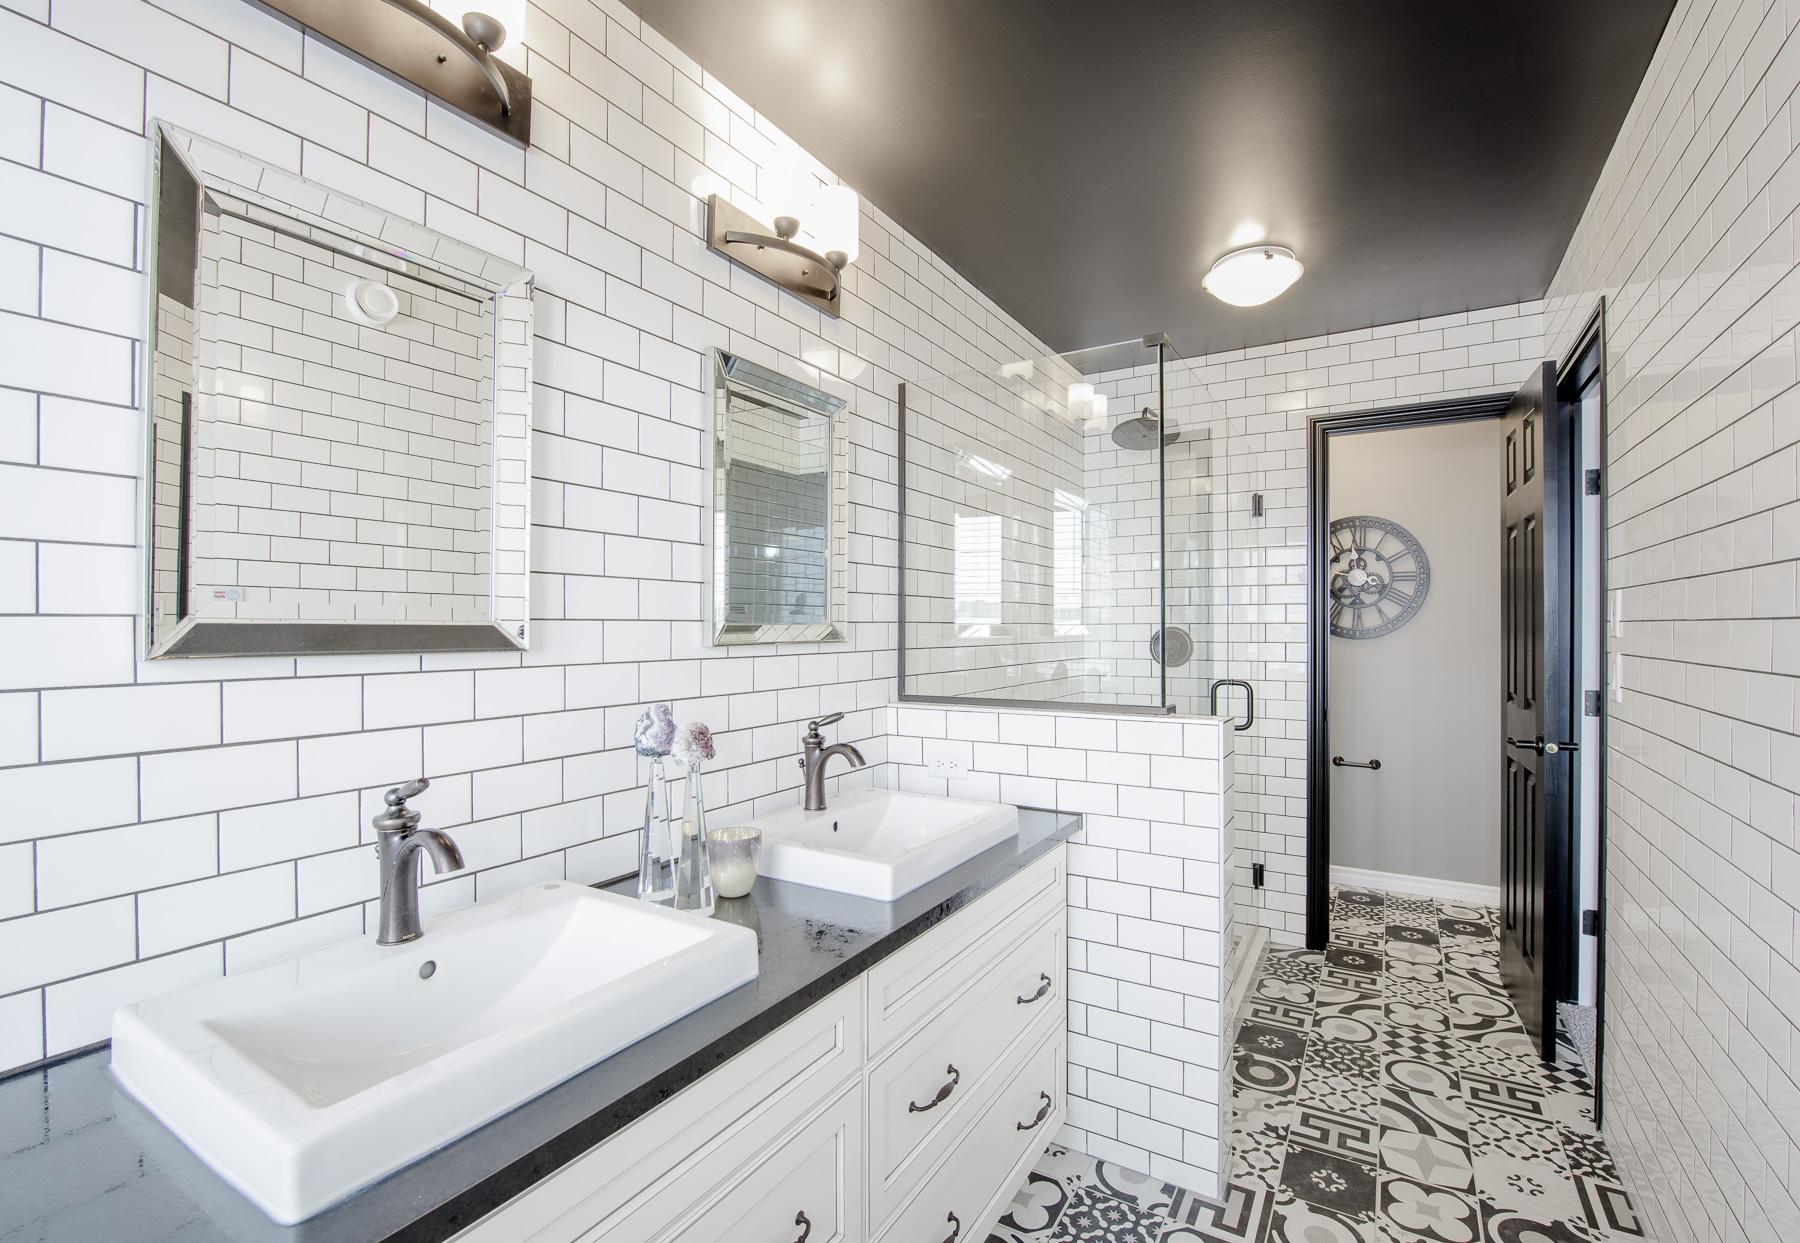 Photo of the Swift bathroom